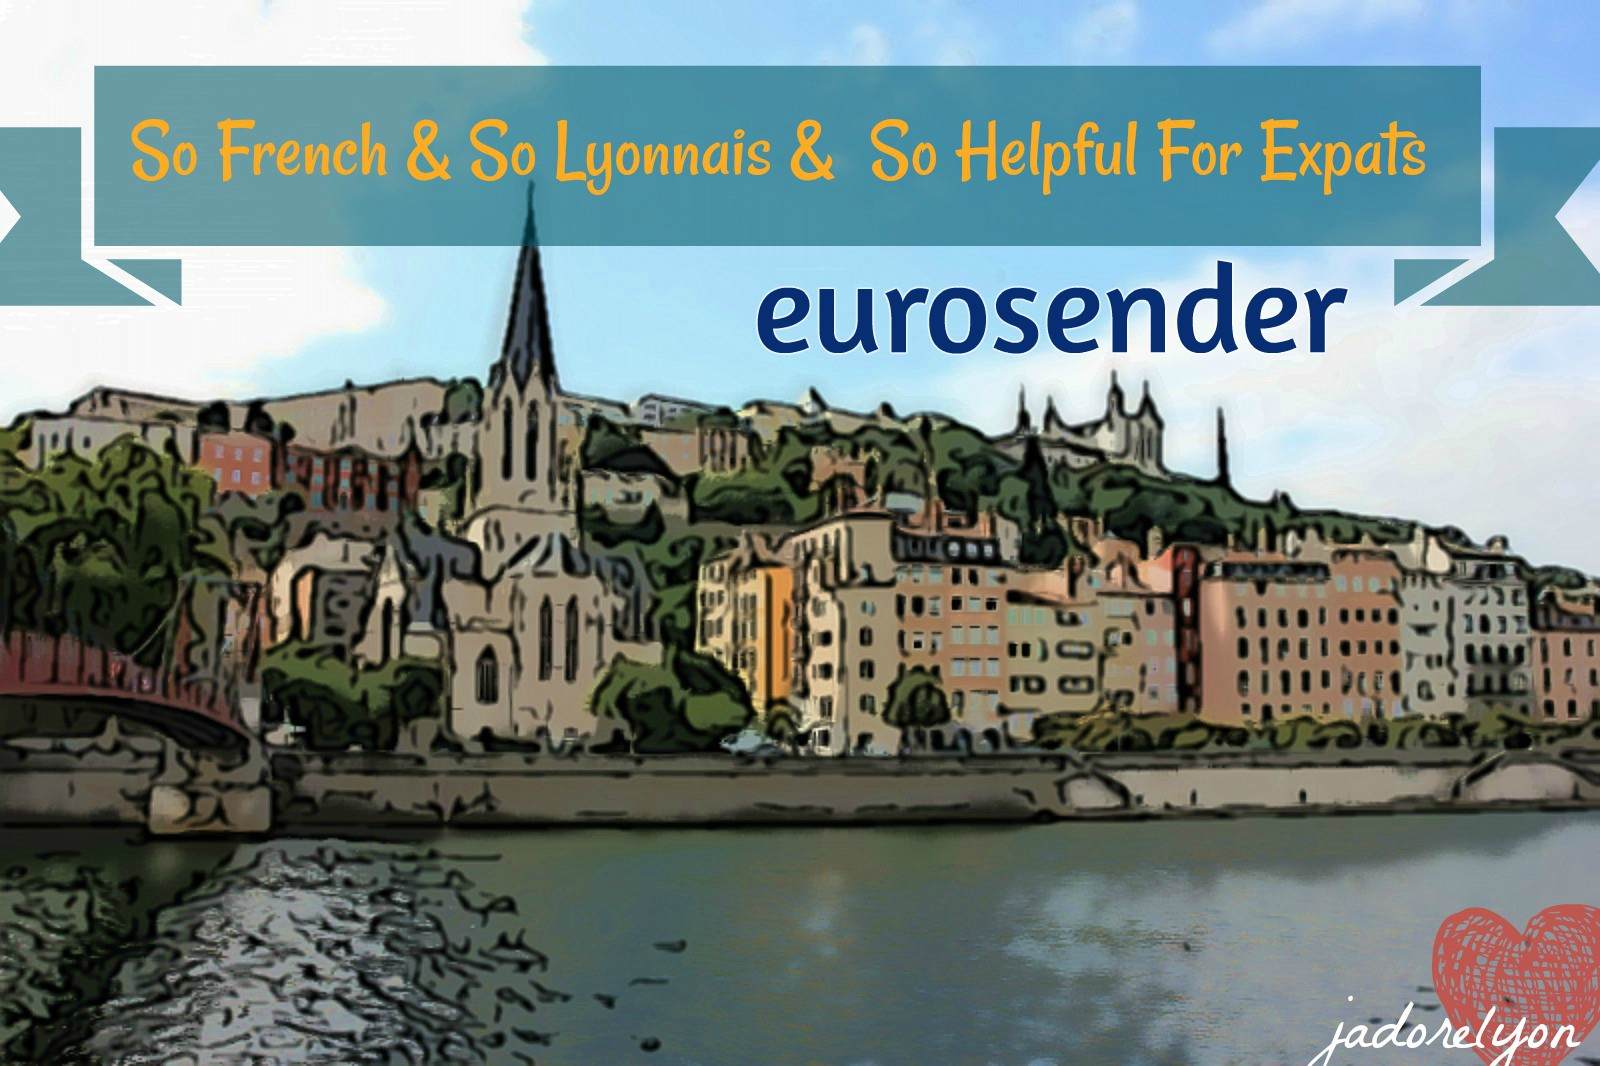 So French So Lyonnais So Helpful For Expats - eurosender